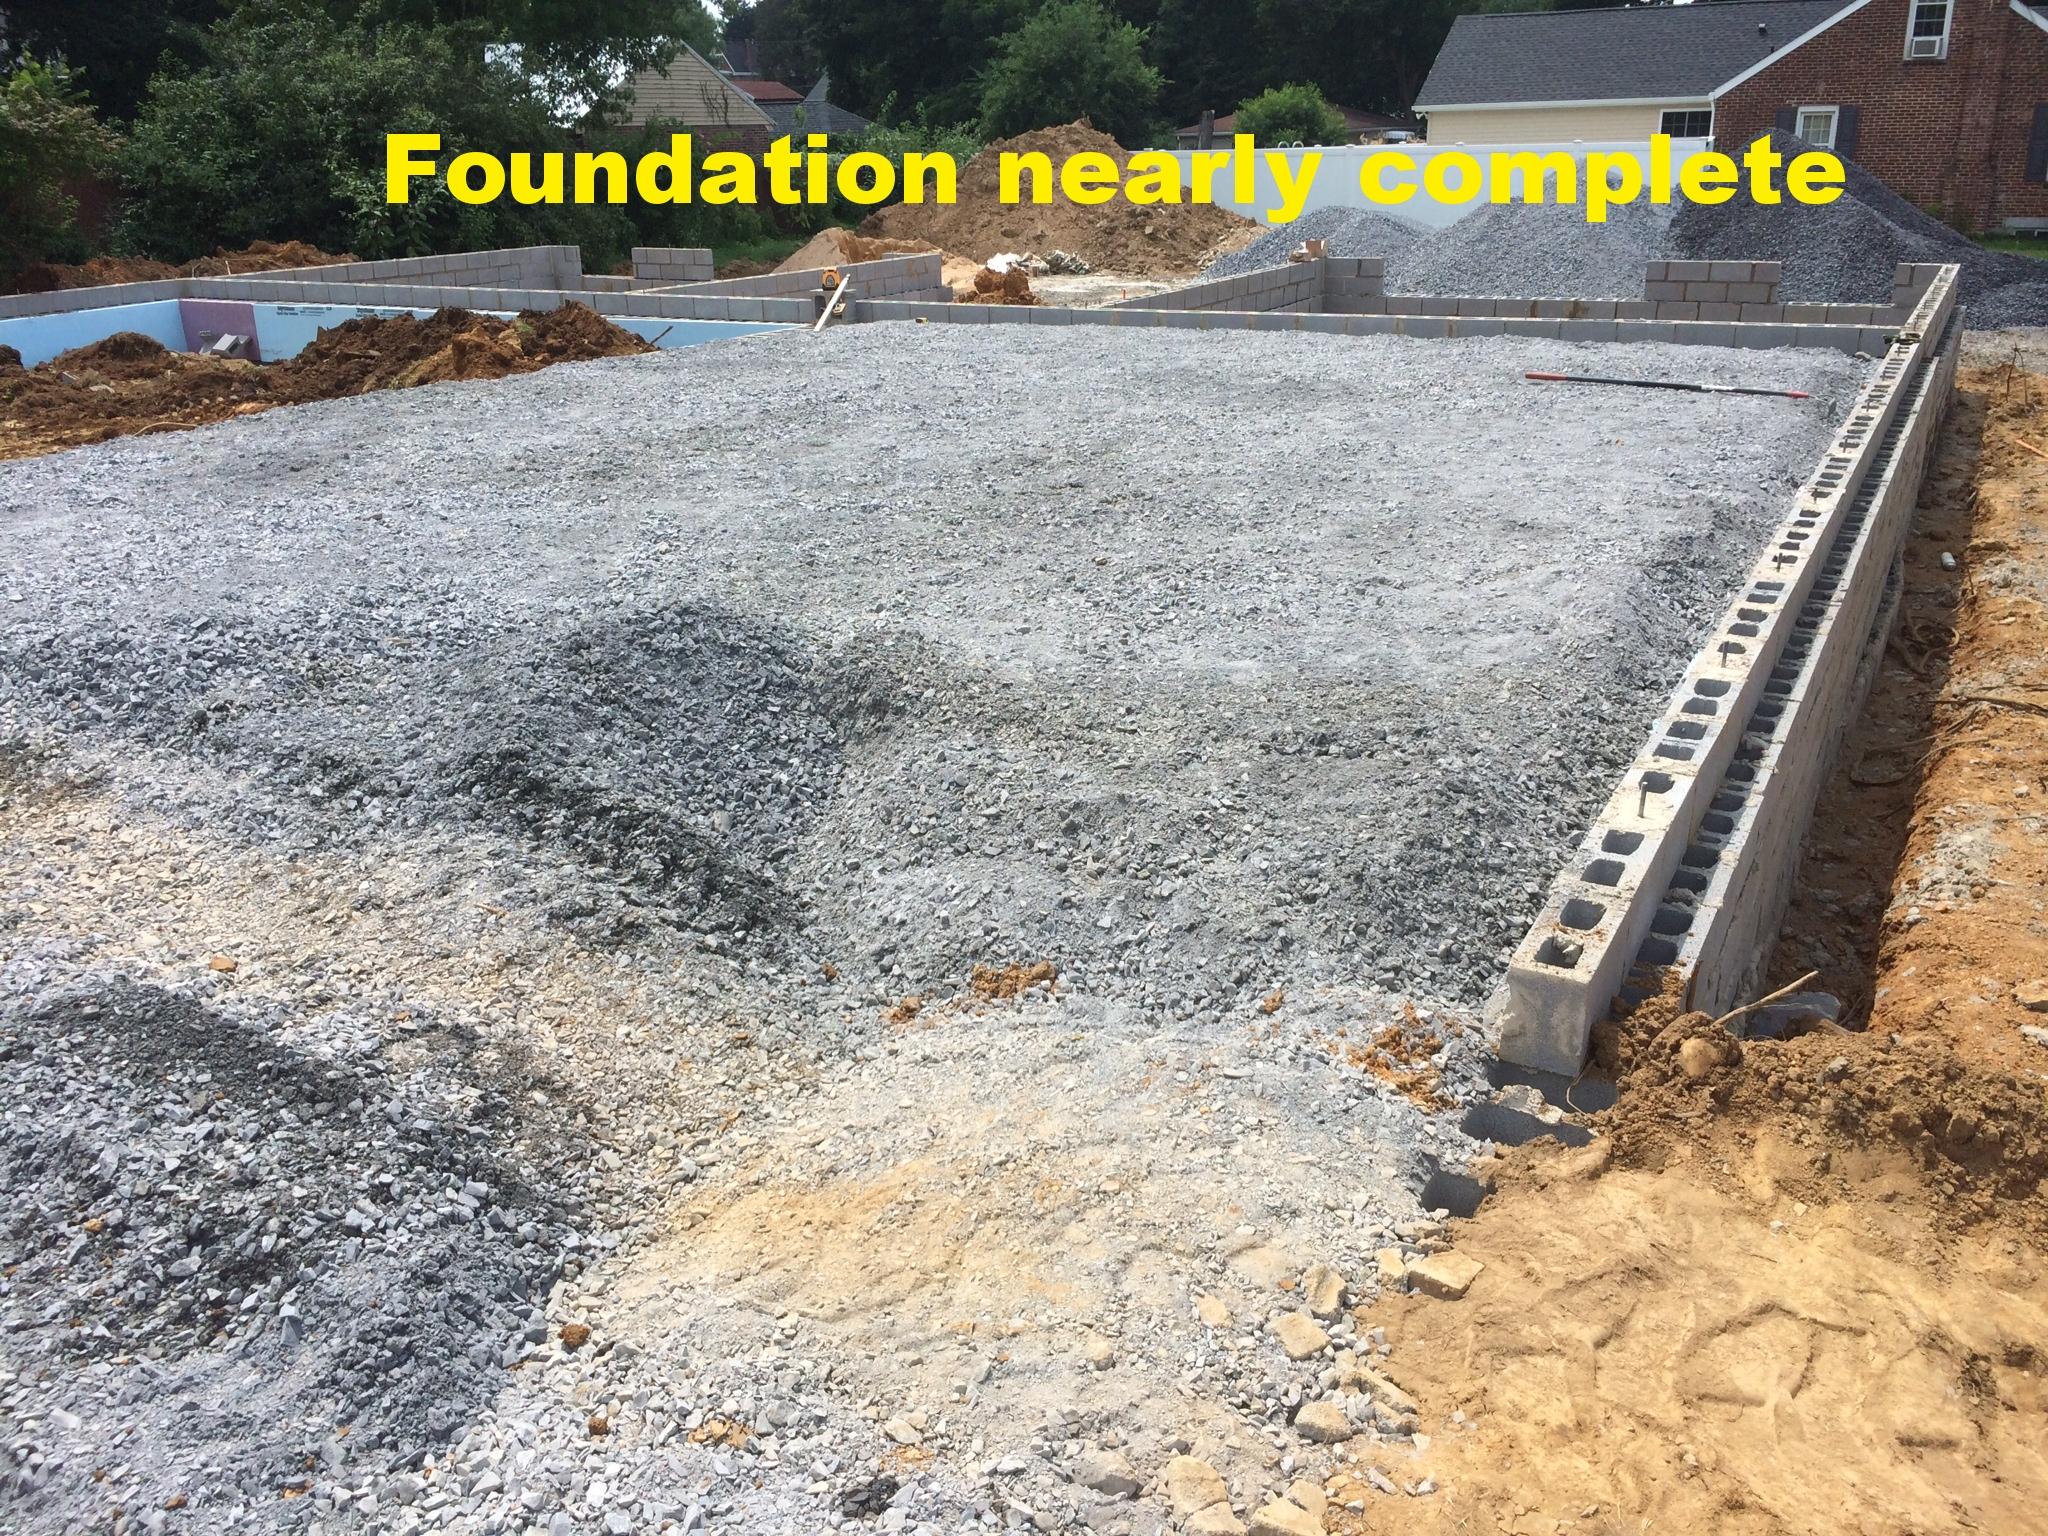 07.20.17_foundation work 4.JPG